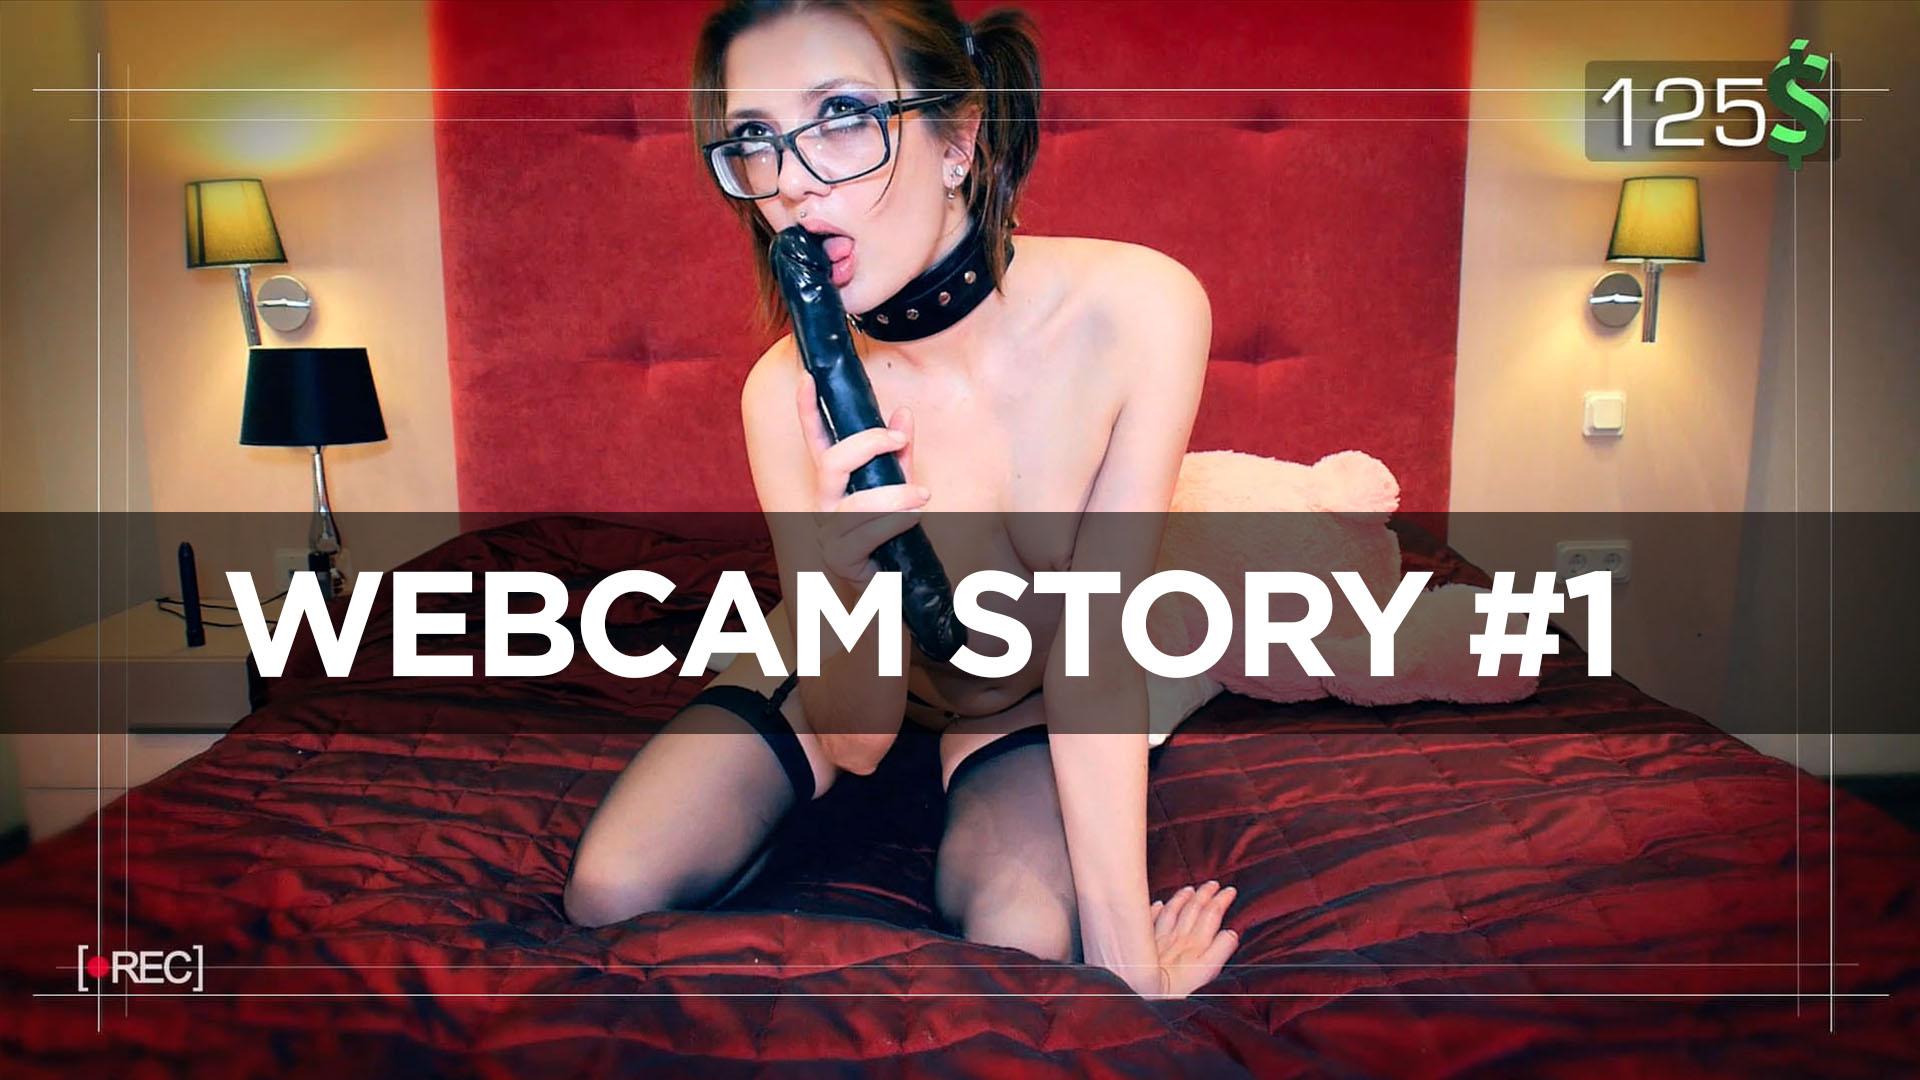 Webcam Story - SWEETYX